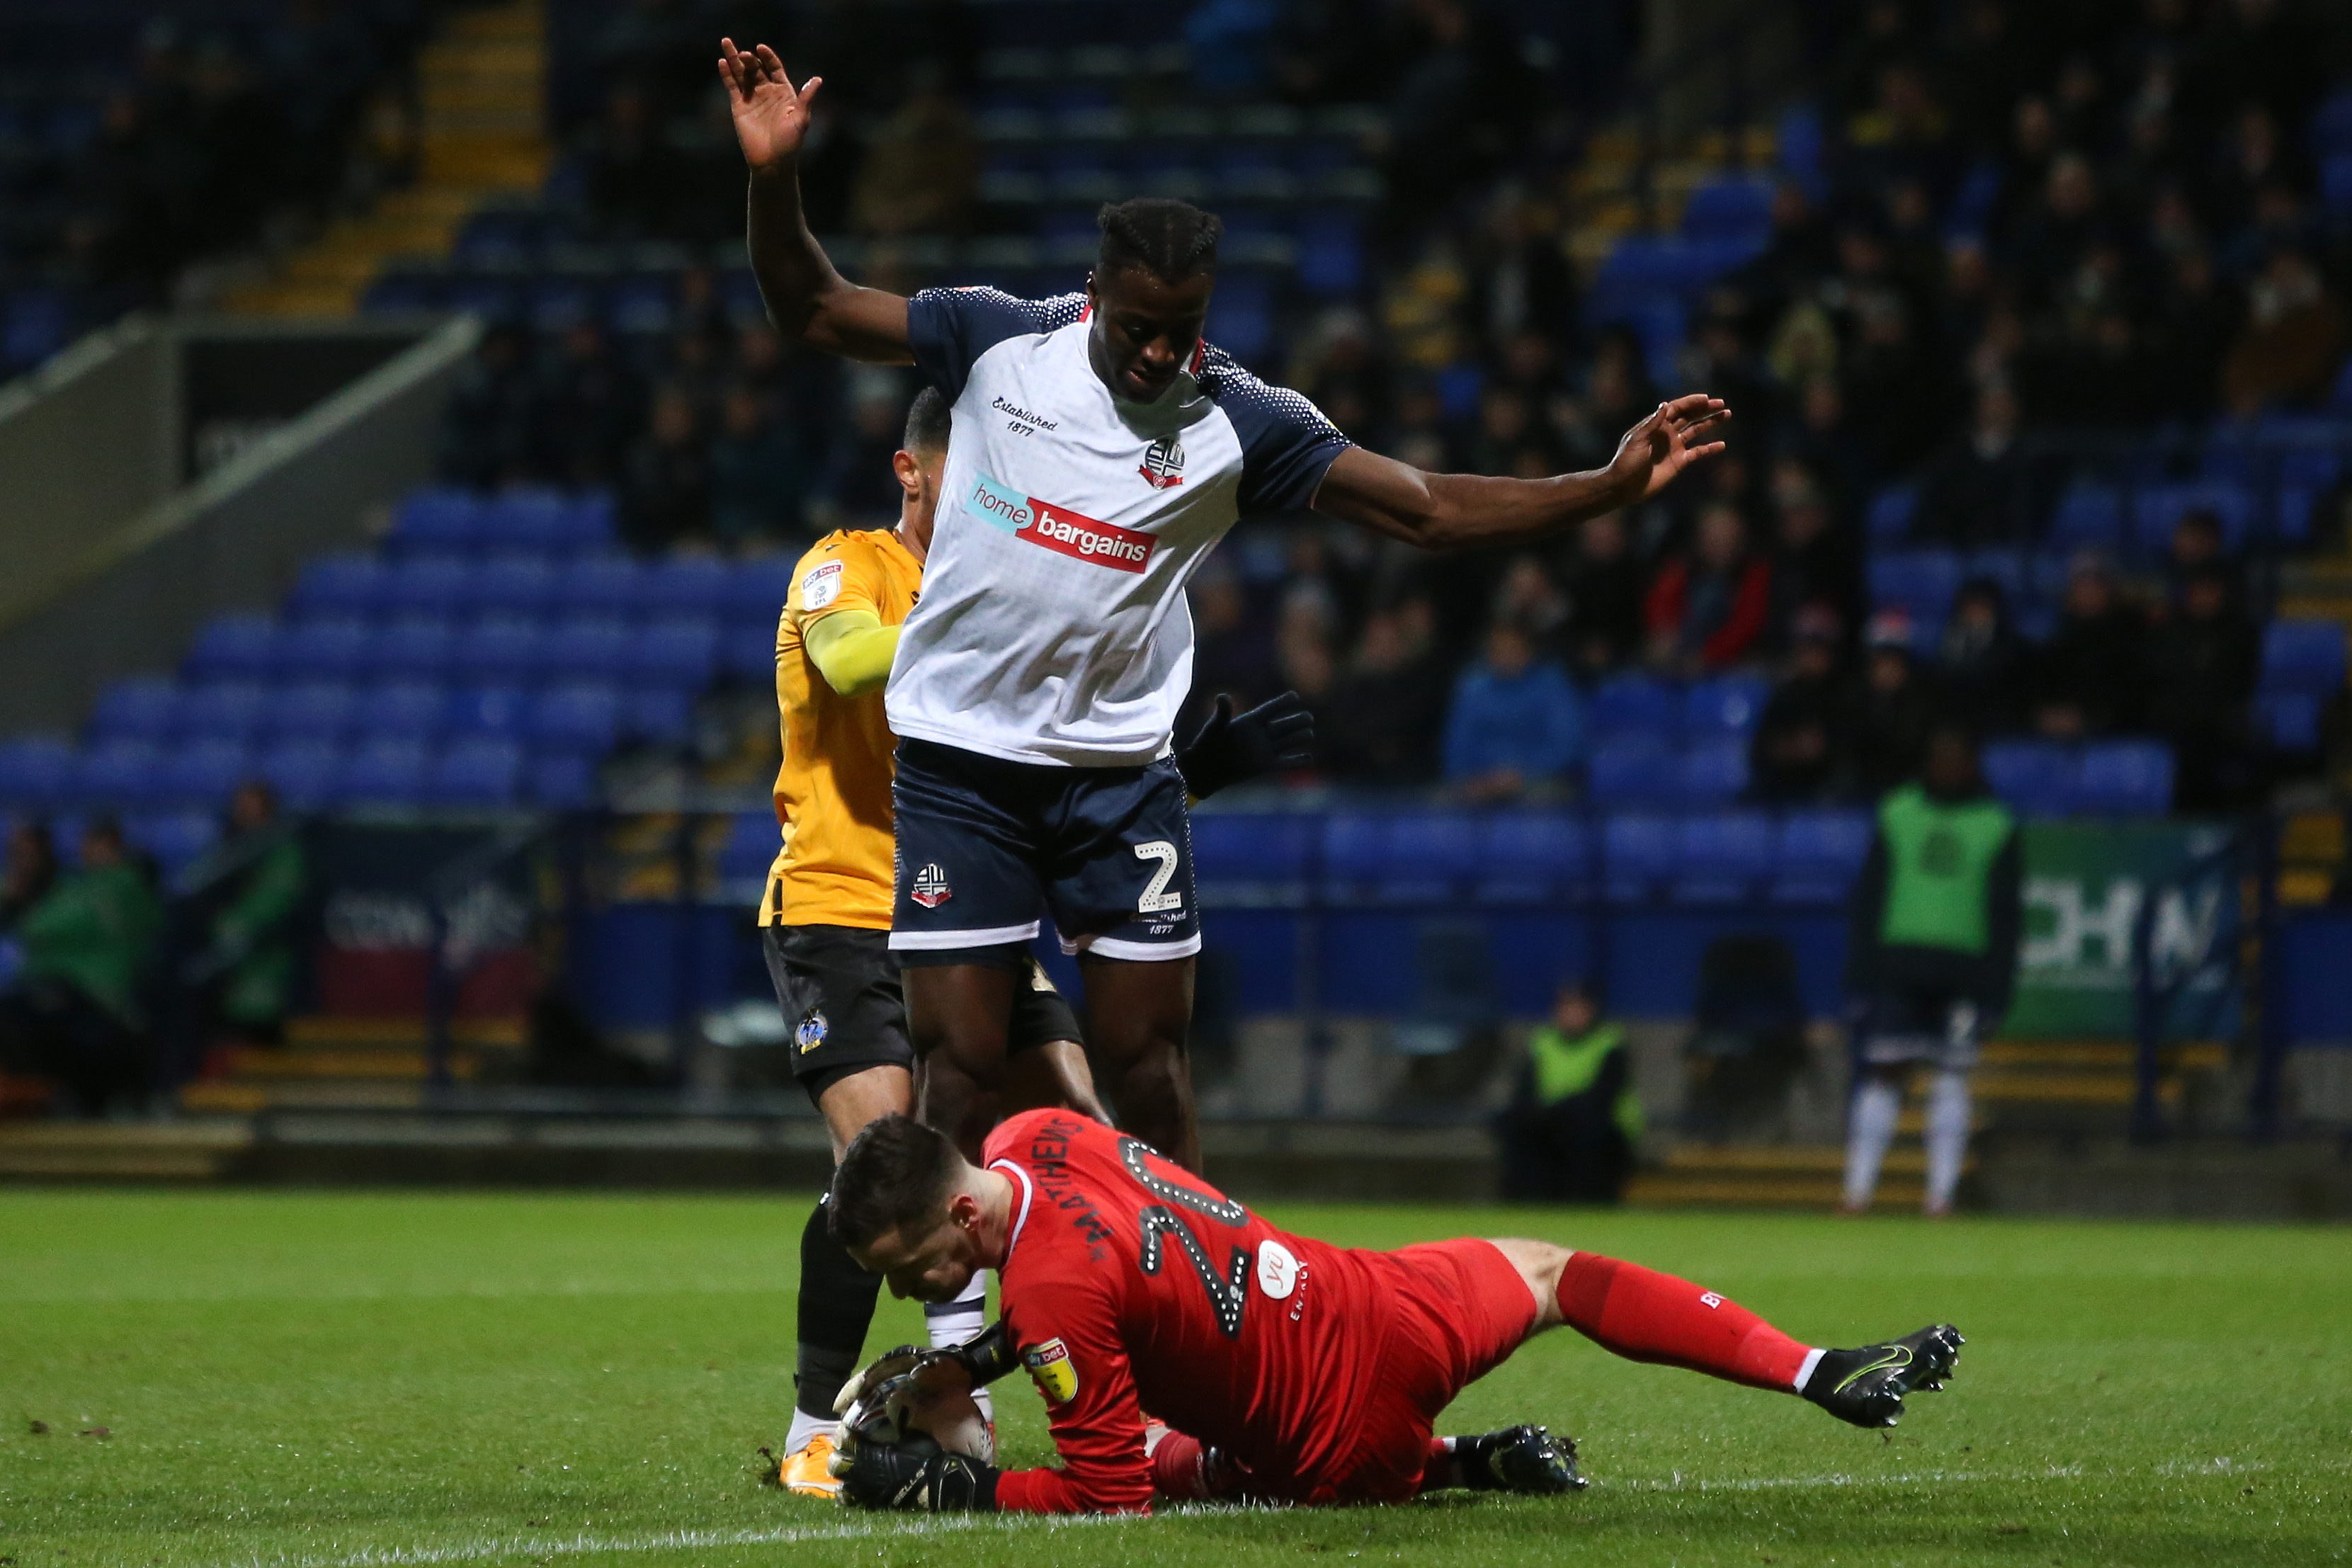 Bolton Wanderers v Bristol Rovers - Sky Bet League One